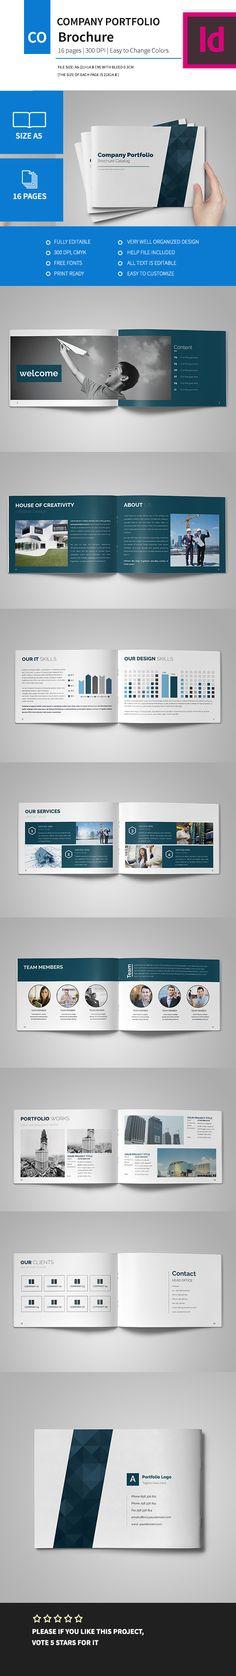 Flyer brochure design, business flyer size A4 template, creative - company portfolio template